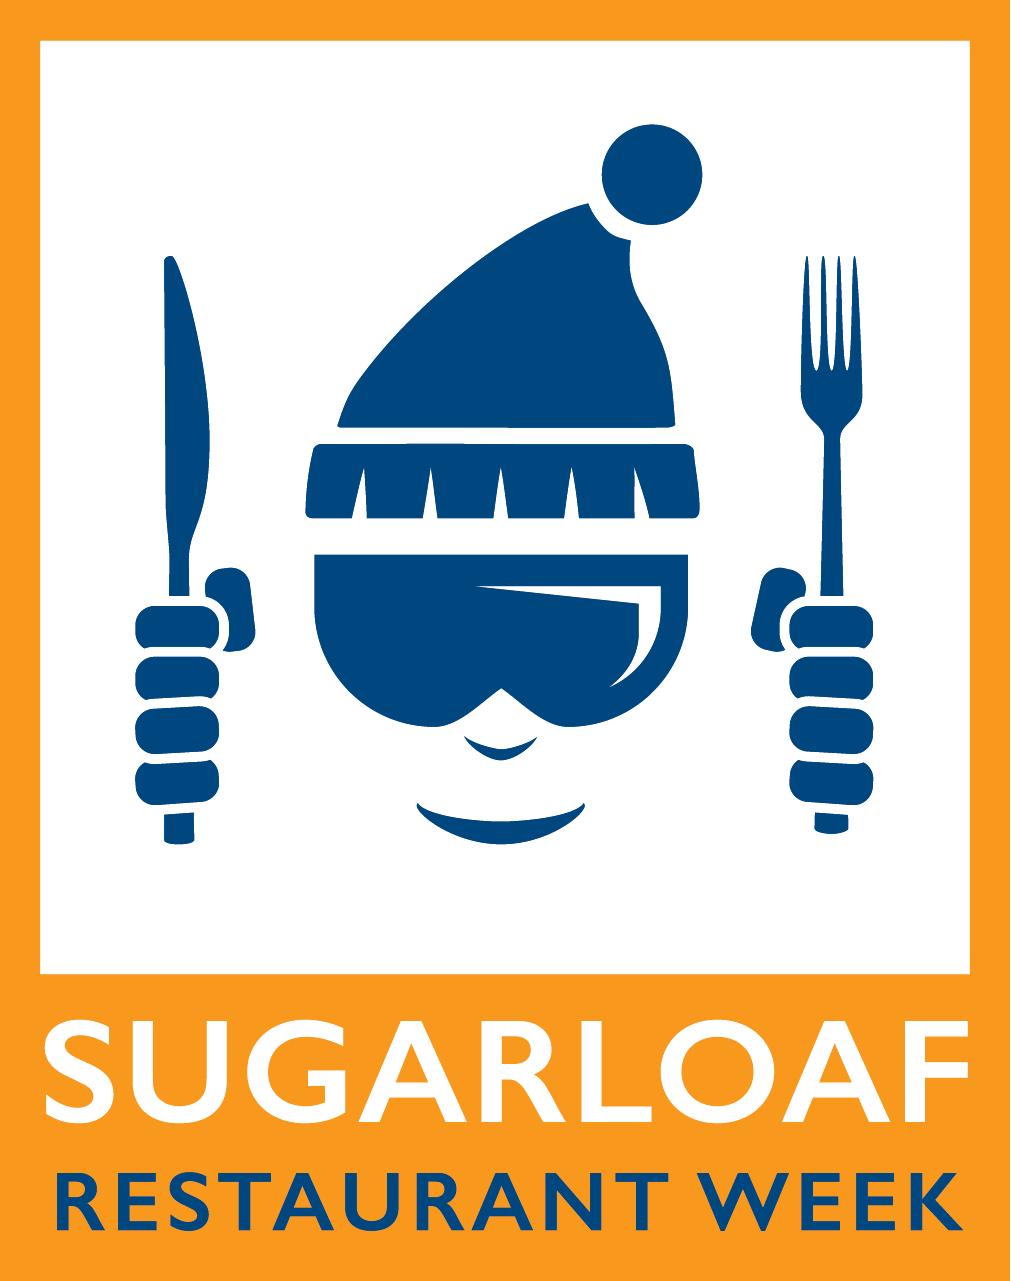 Sugarloaf Restaurant Week Logo